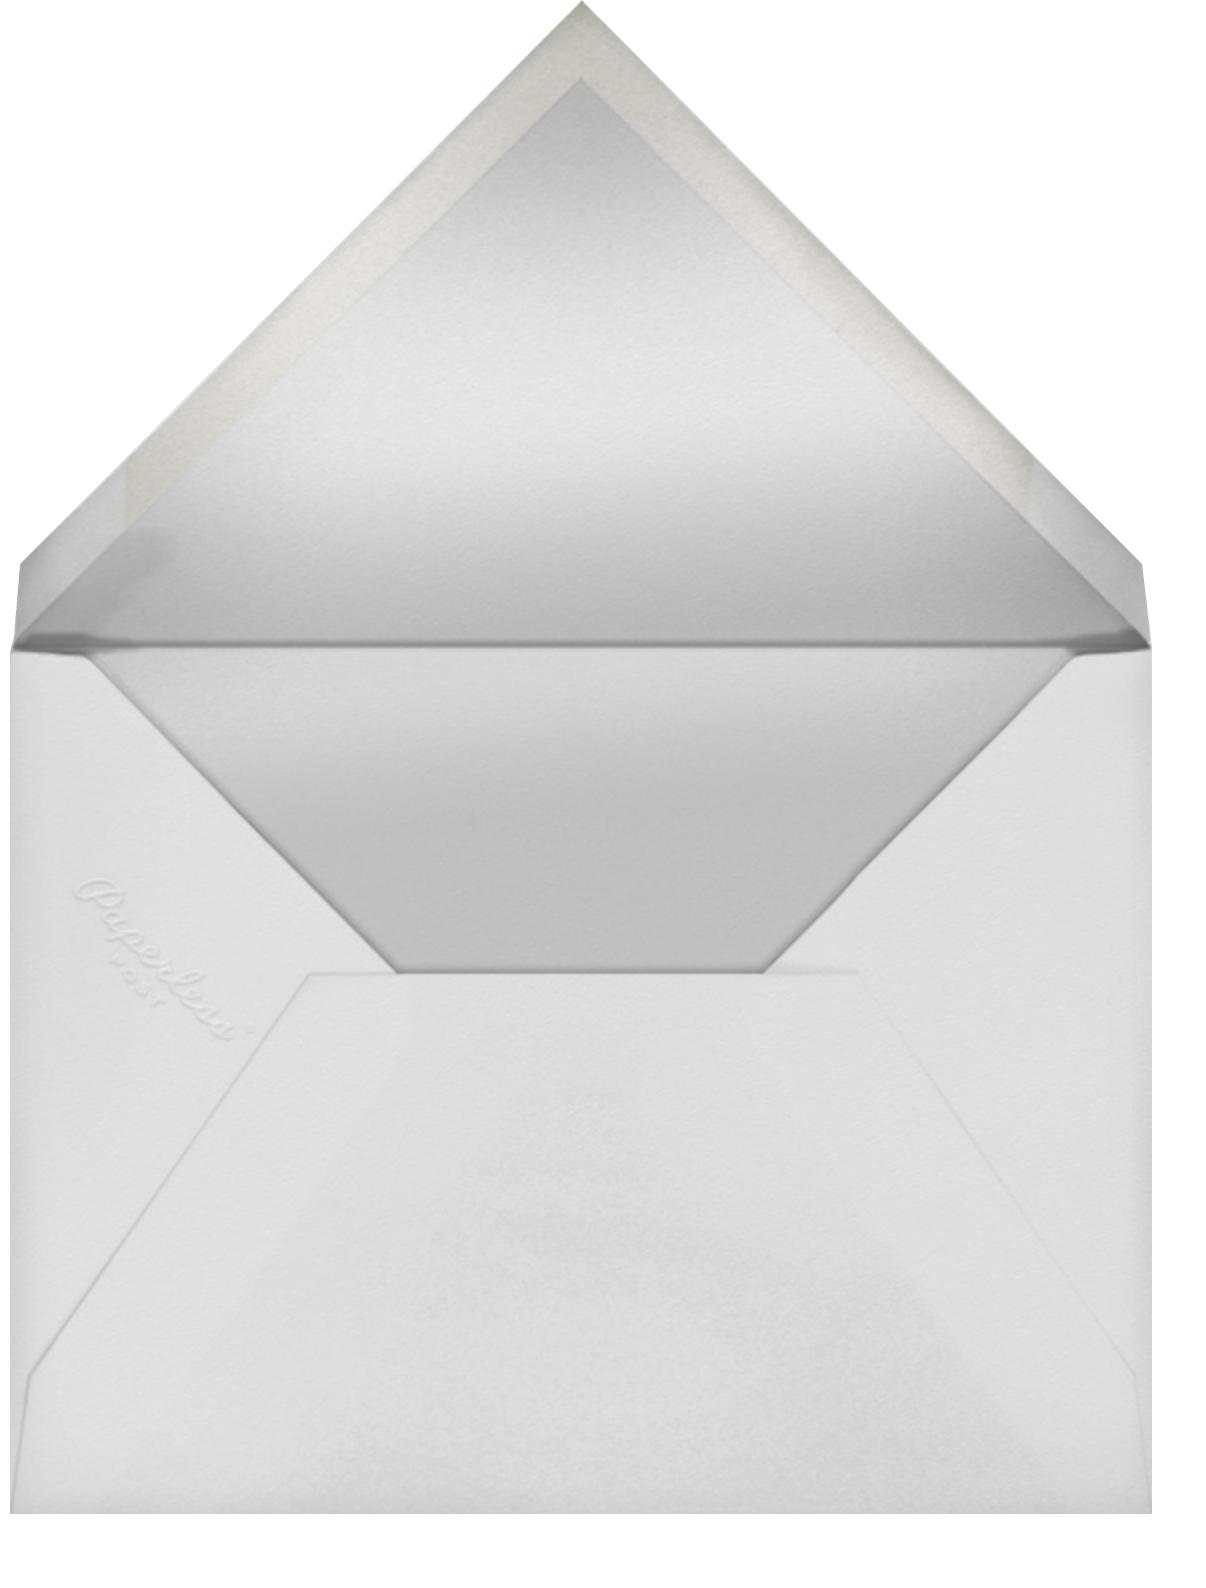 Cherish (Program) - Gold - Kelly Wearstler - Menus and programs - envelope back